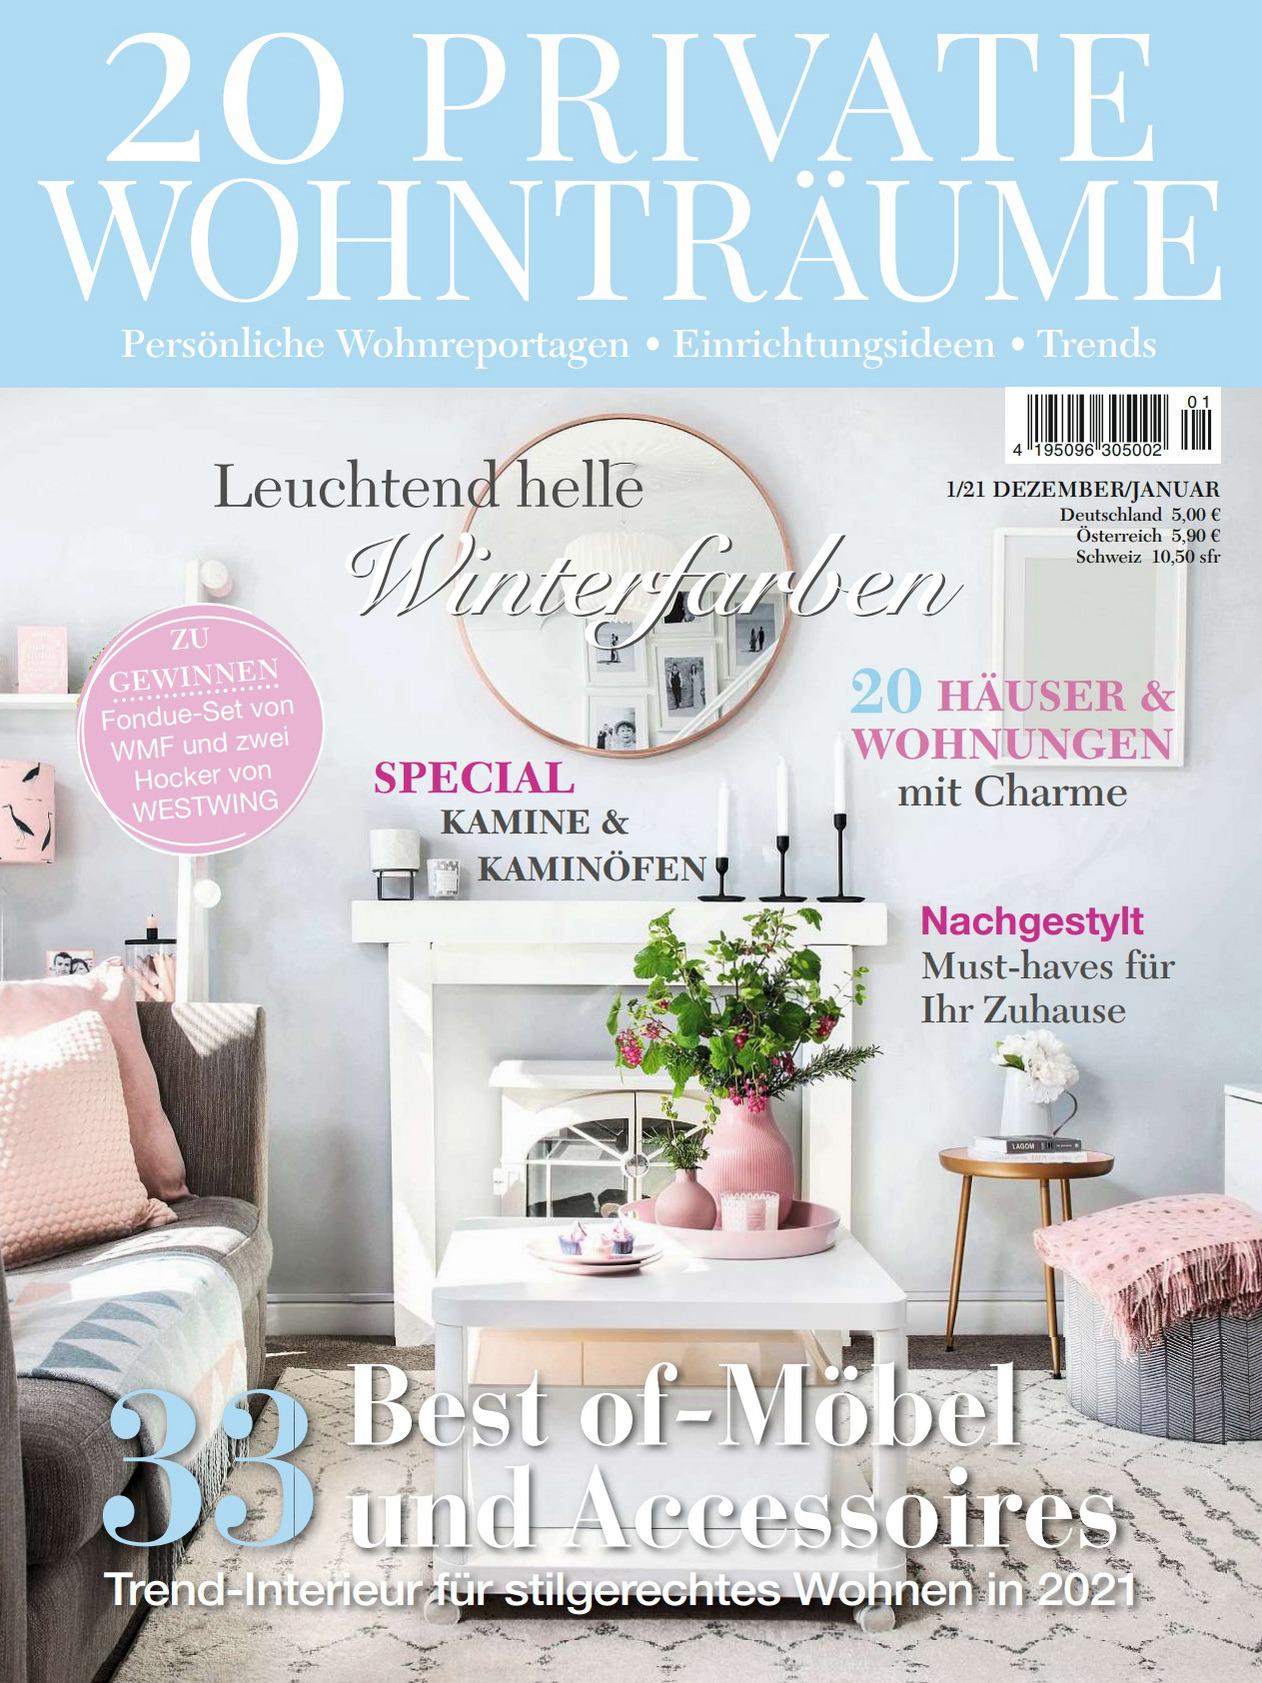 《20 Private Wohntraume》德国版室内室外设计杂志2020年12月-2021年01月号